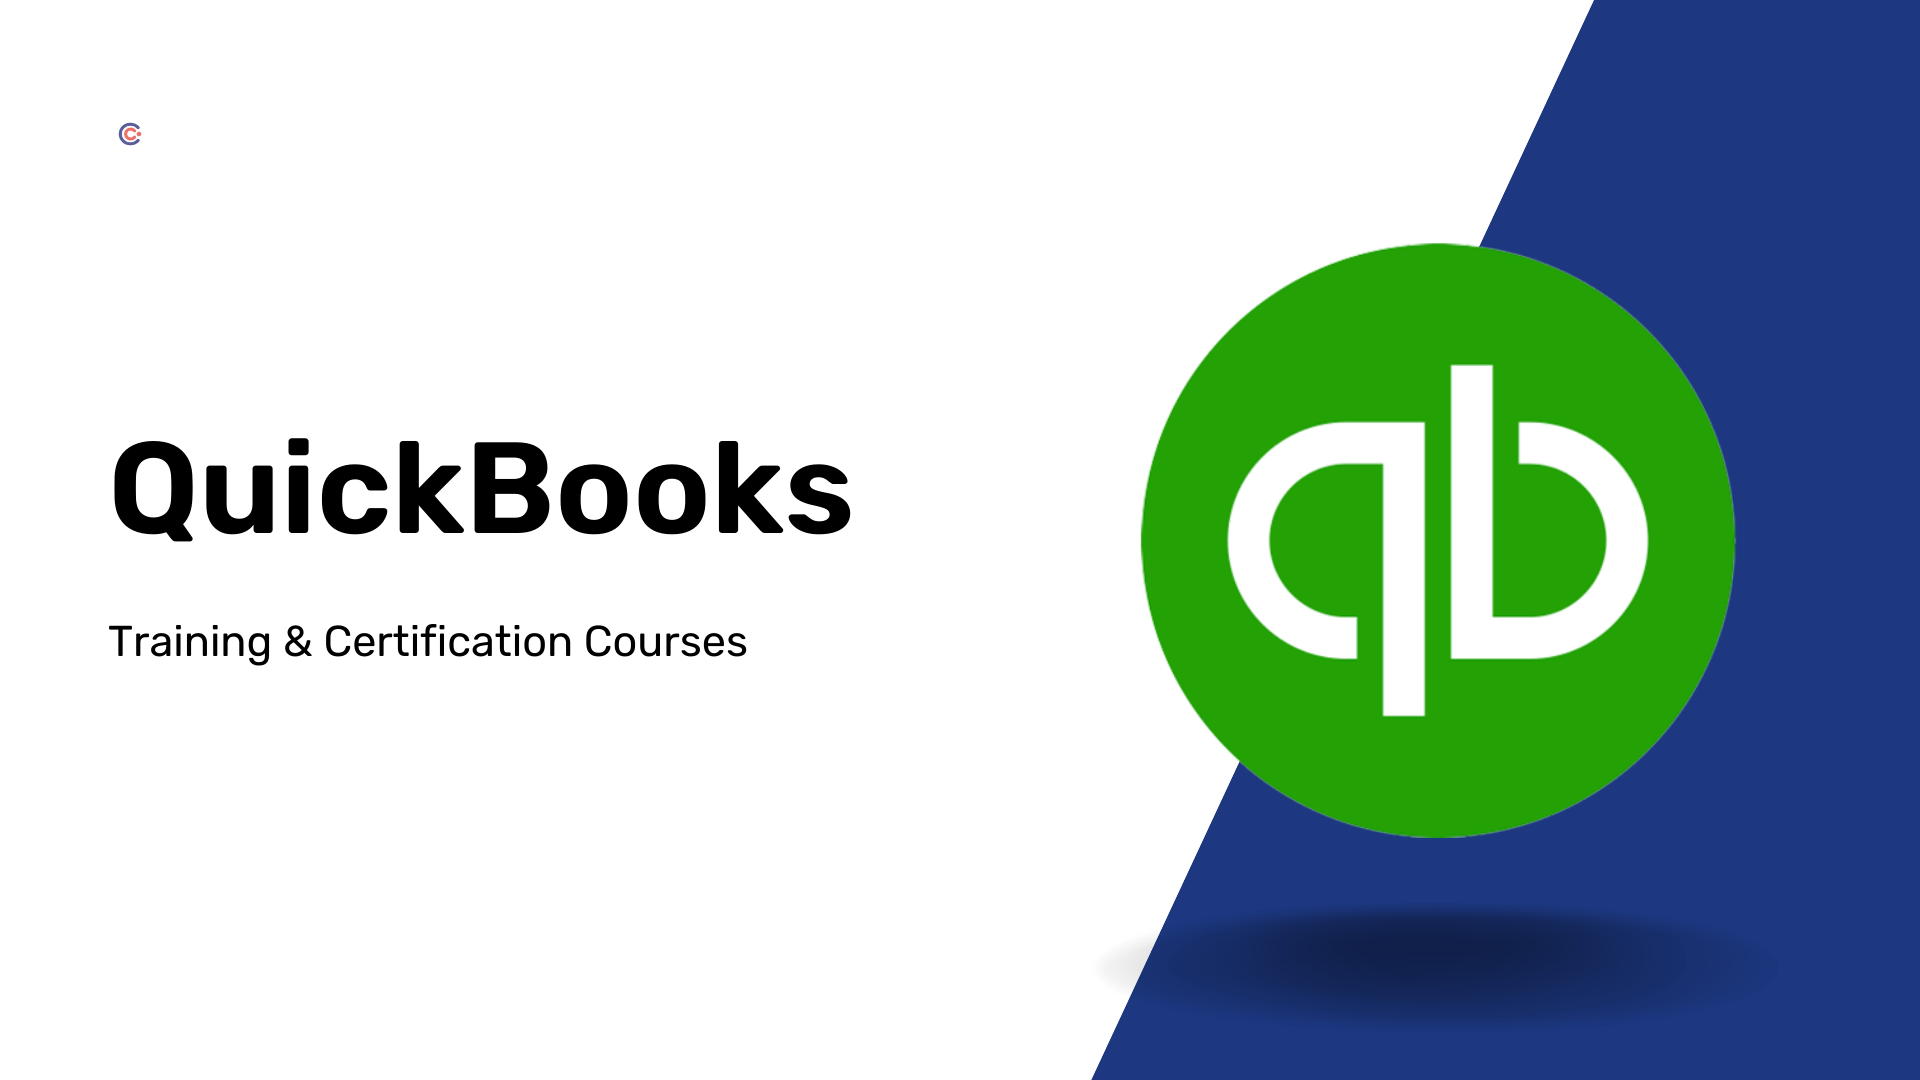 8 Best QuickBooks Training & Certification Courses - Learn QuickBooks Online